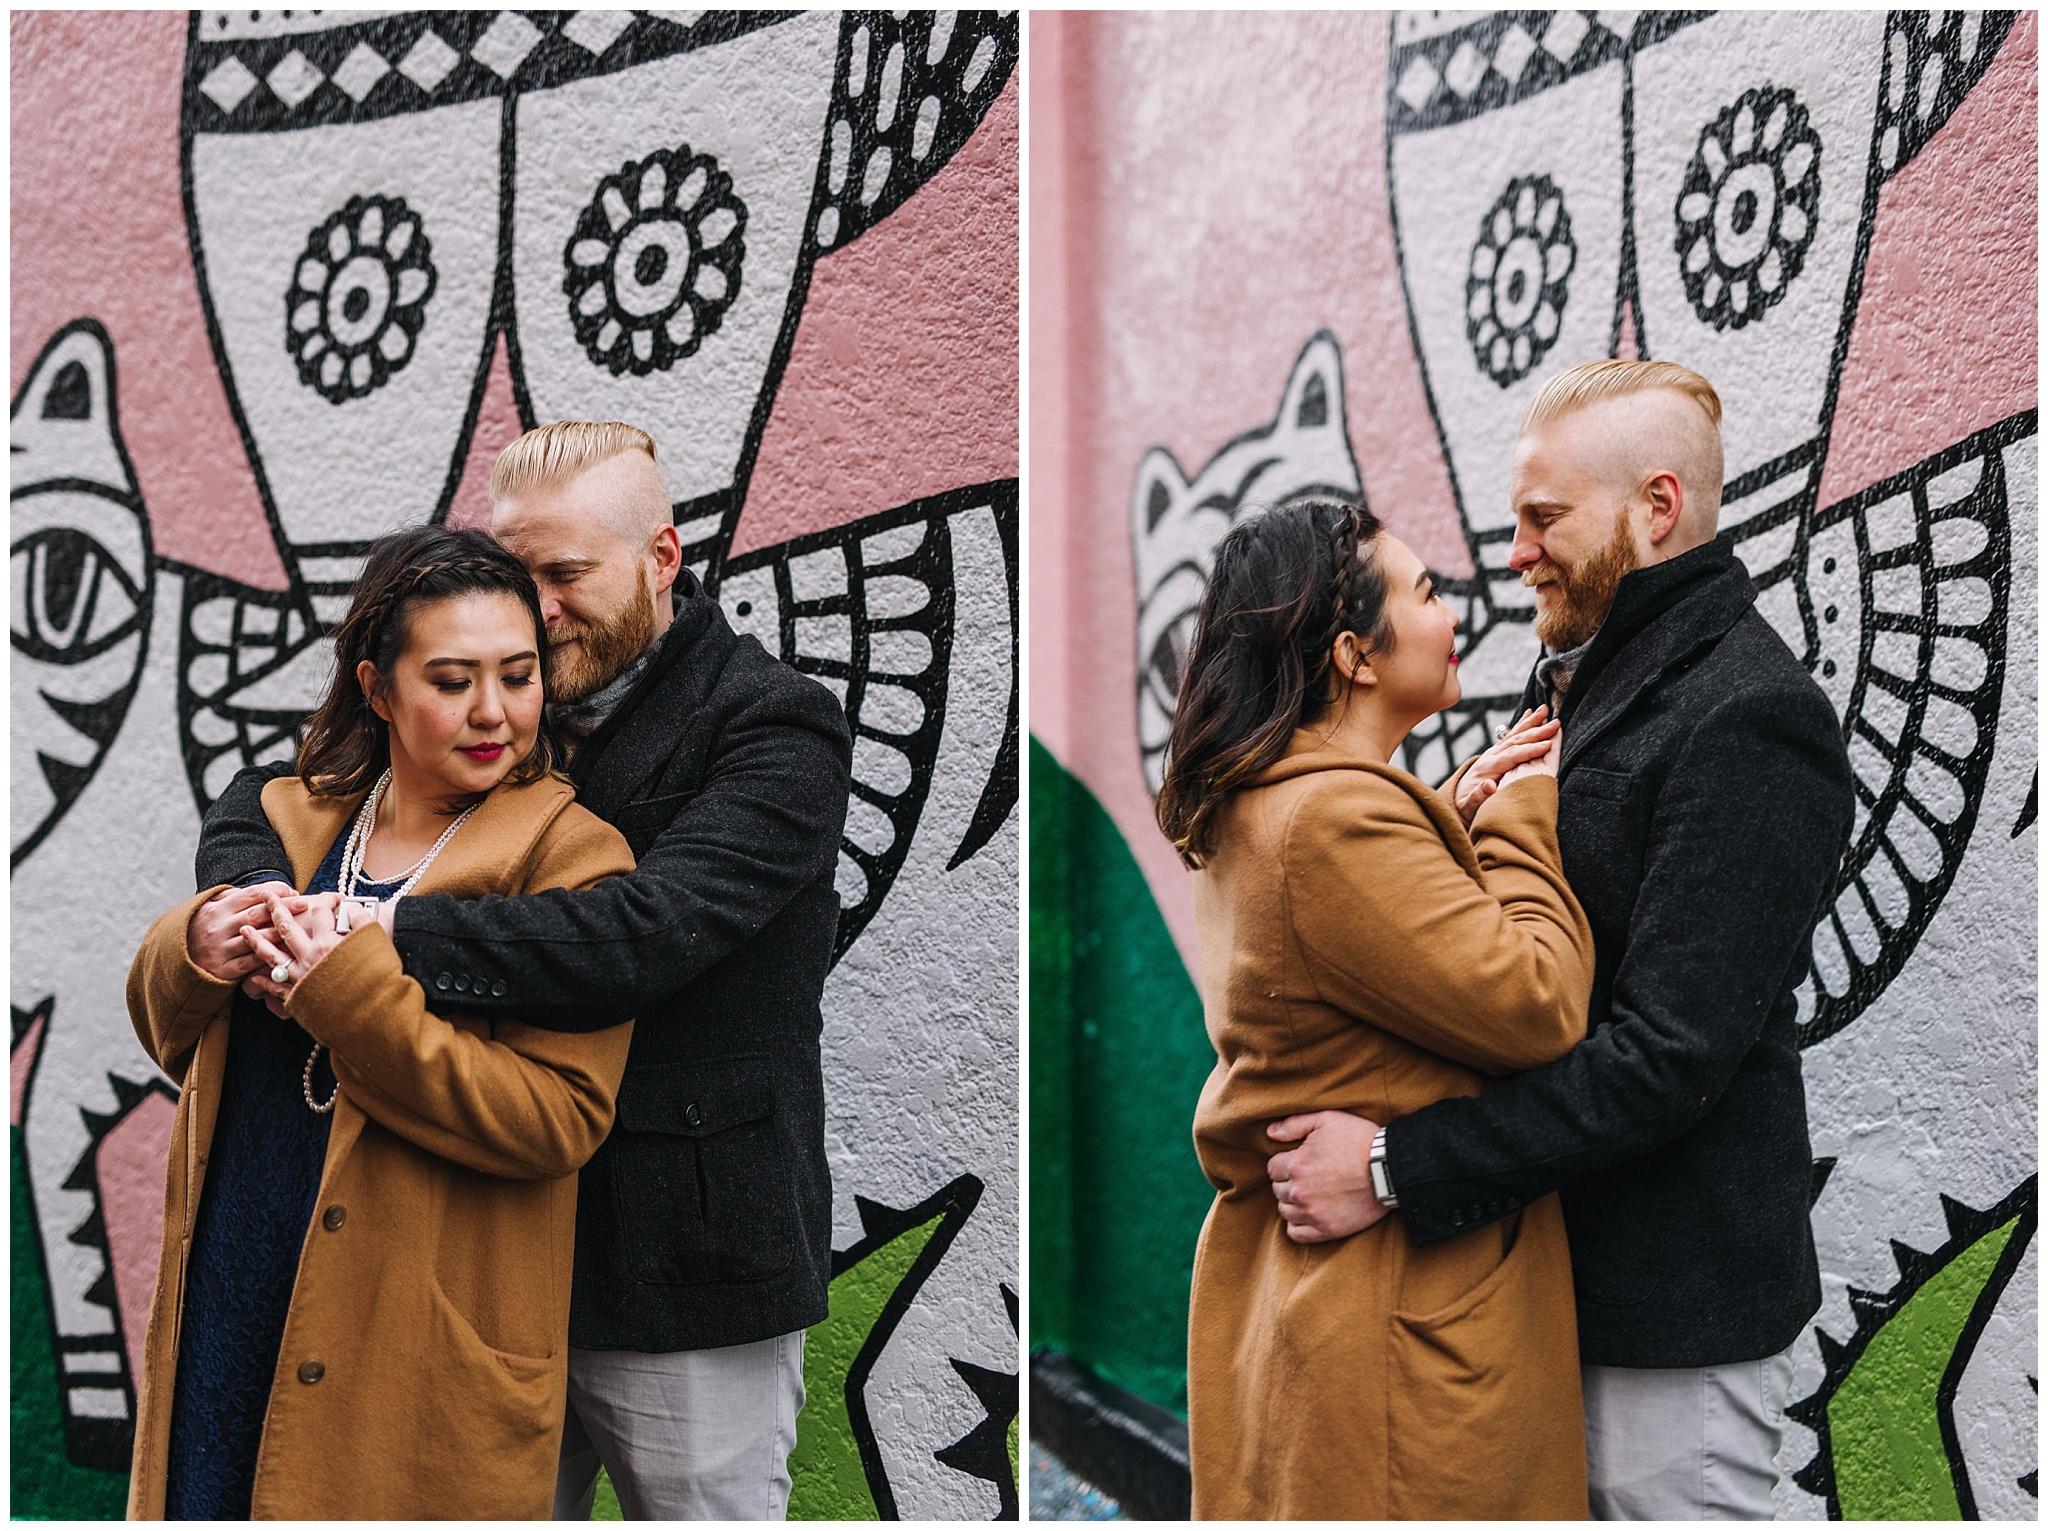 couple in front of mural vancouver mural festival sandeep johal art